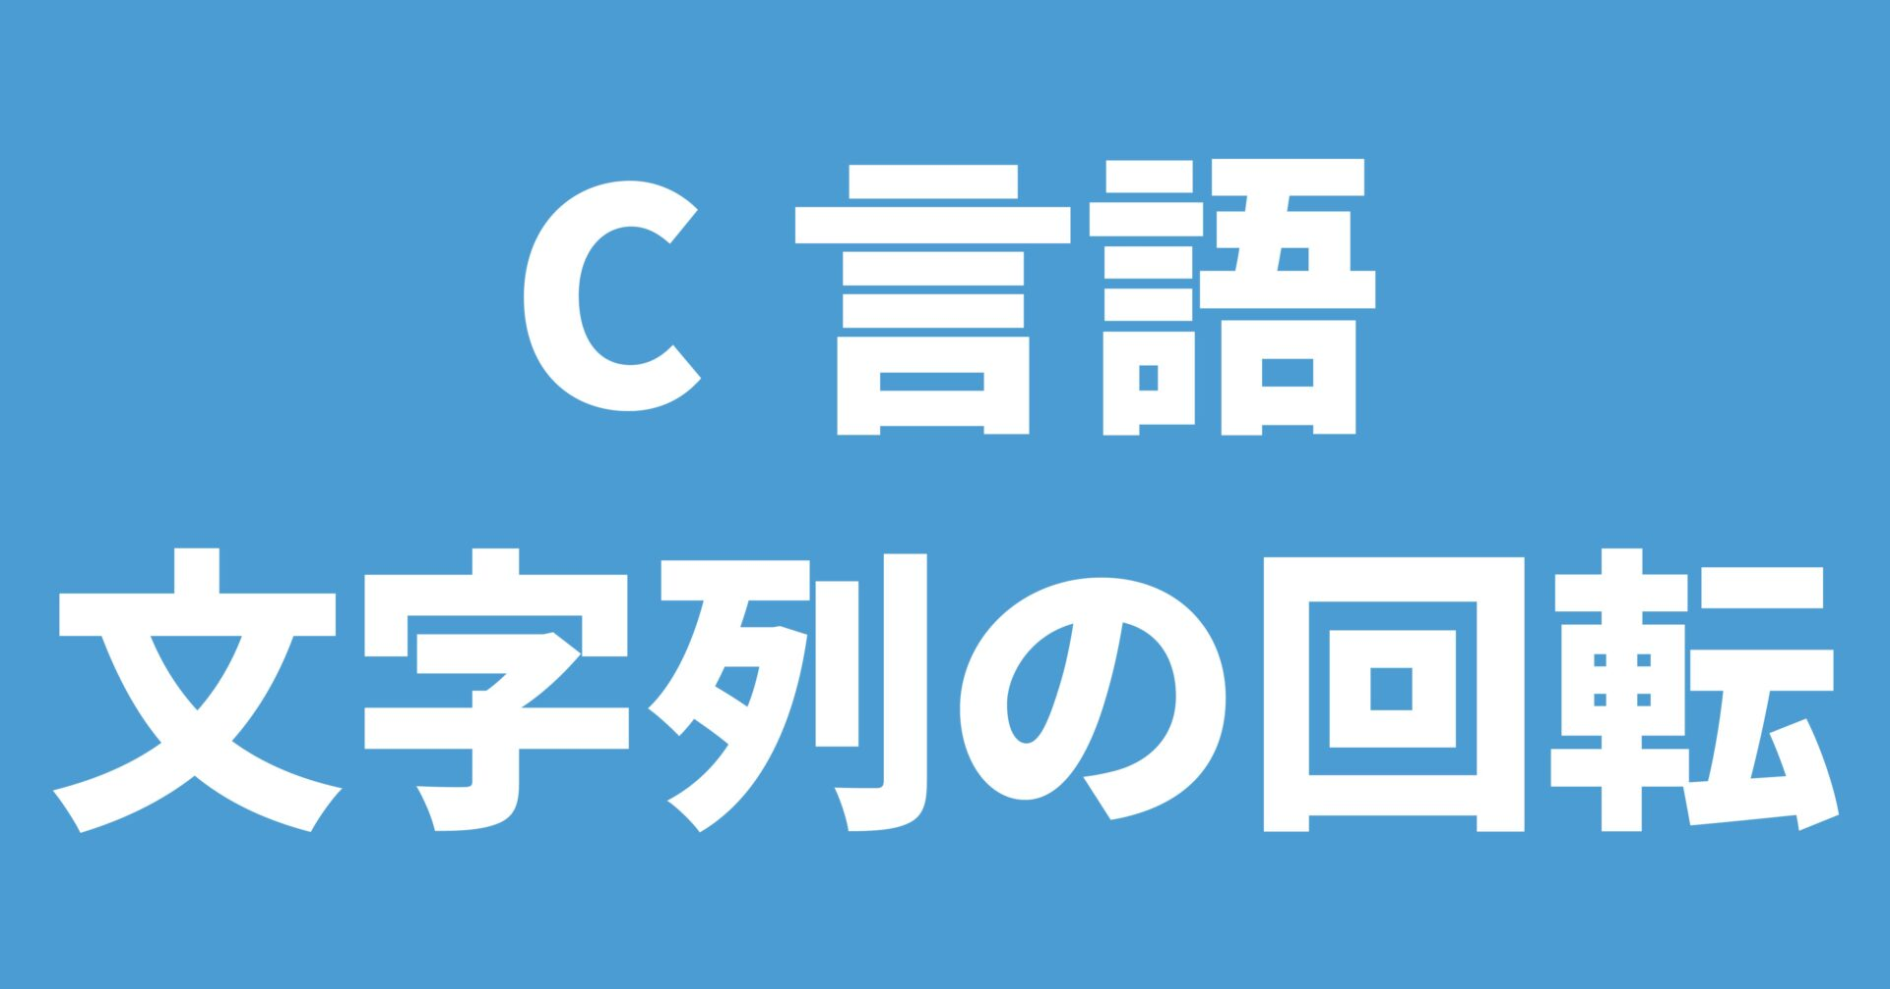 C言語 文字列の回転